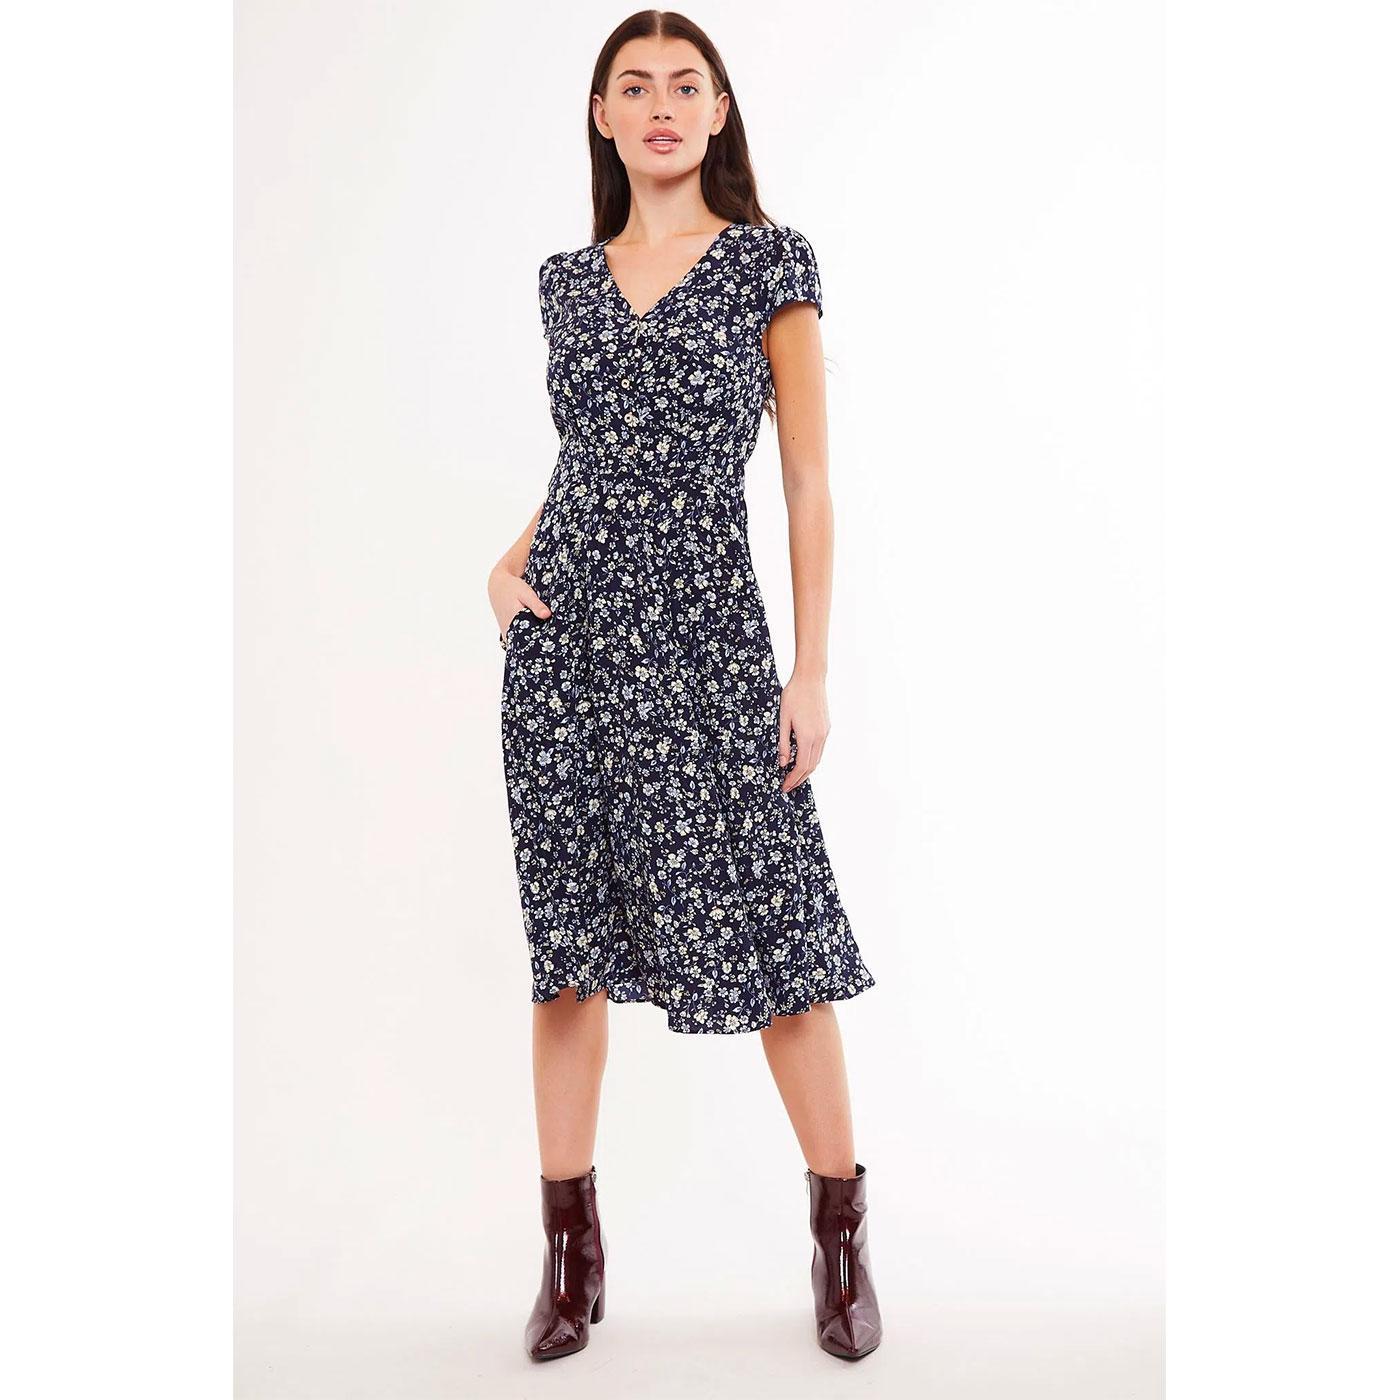 Cathleen LOUCHE Retro Midi Dress in Country Rose